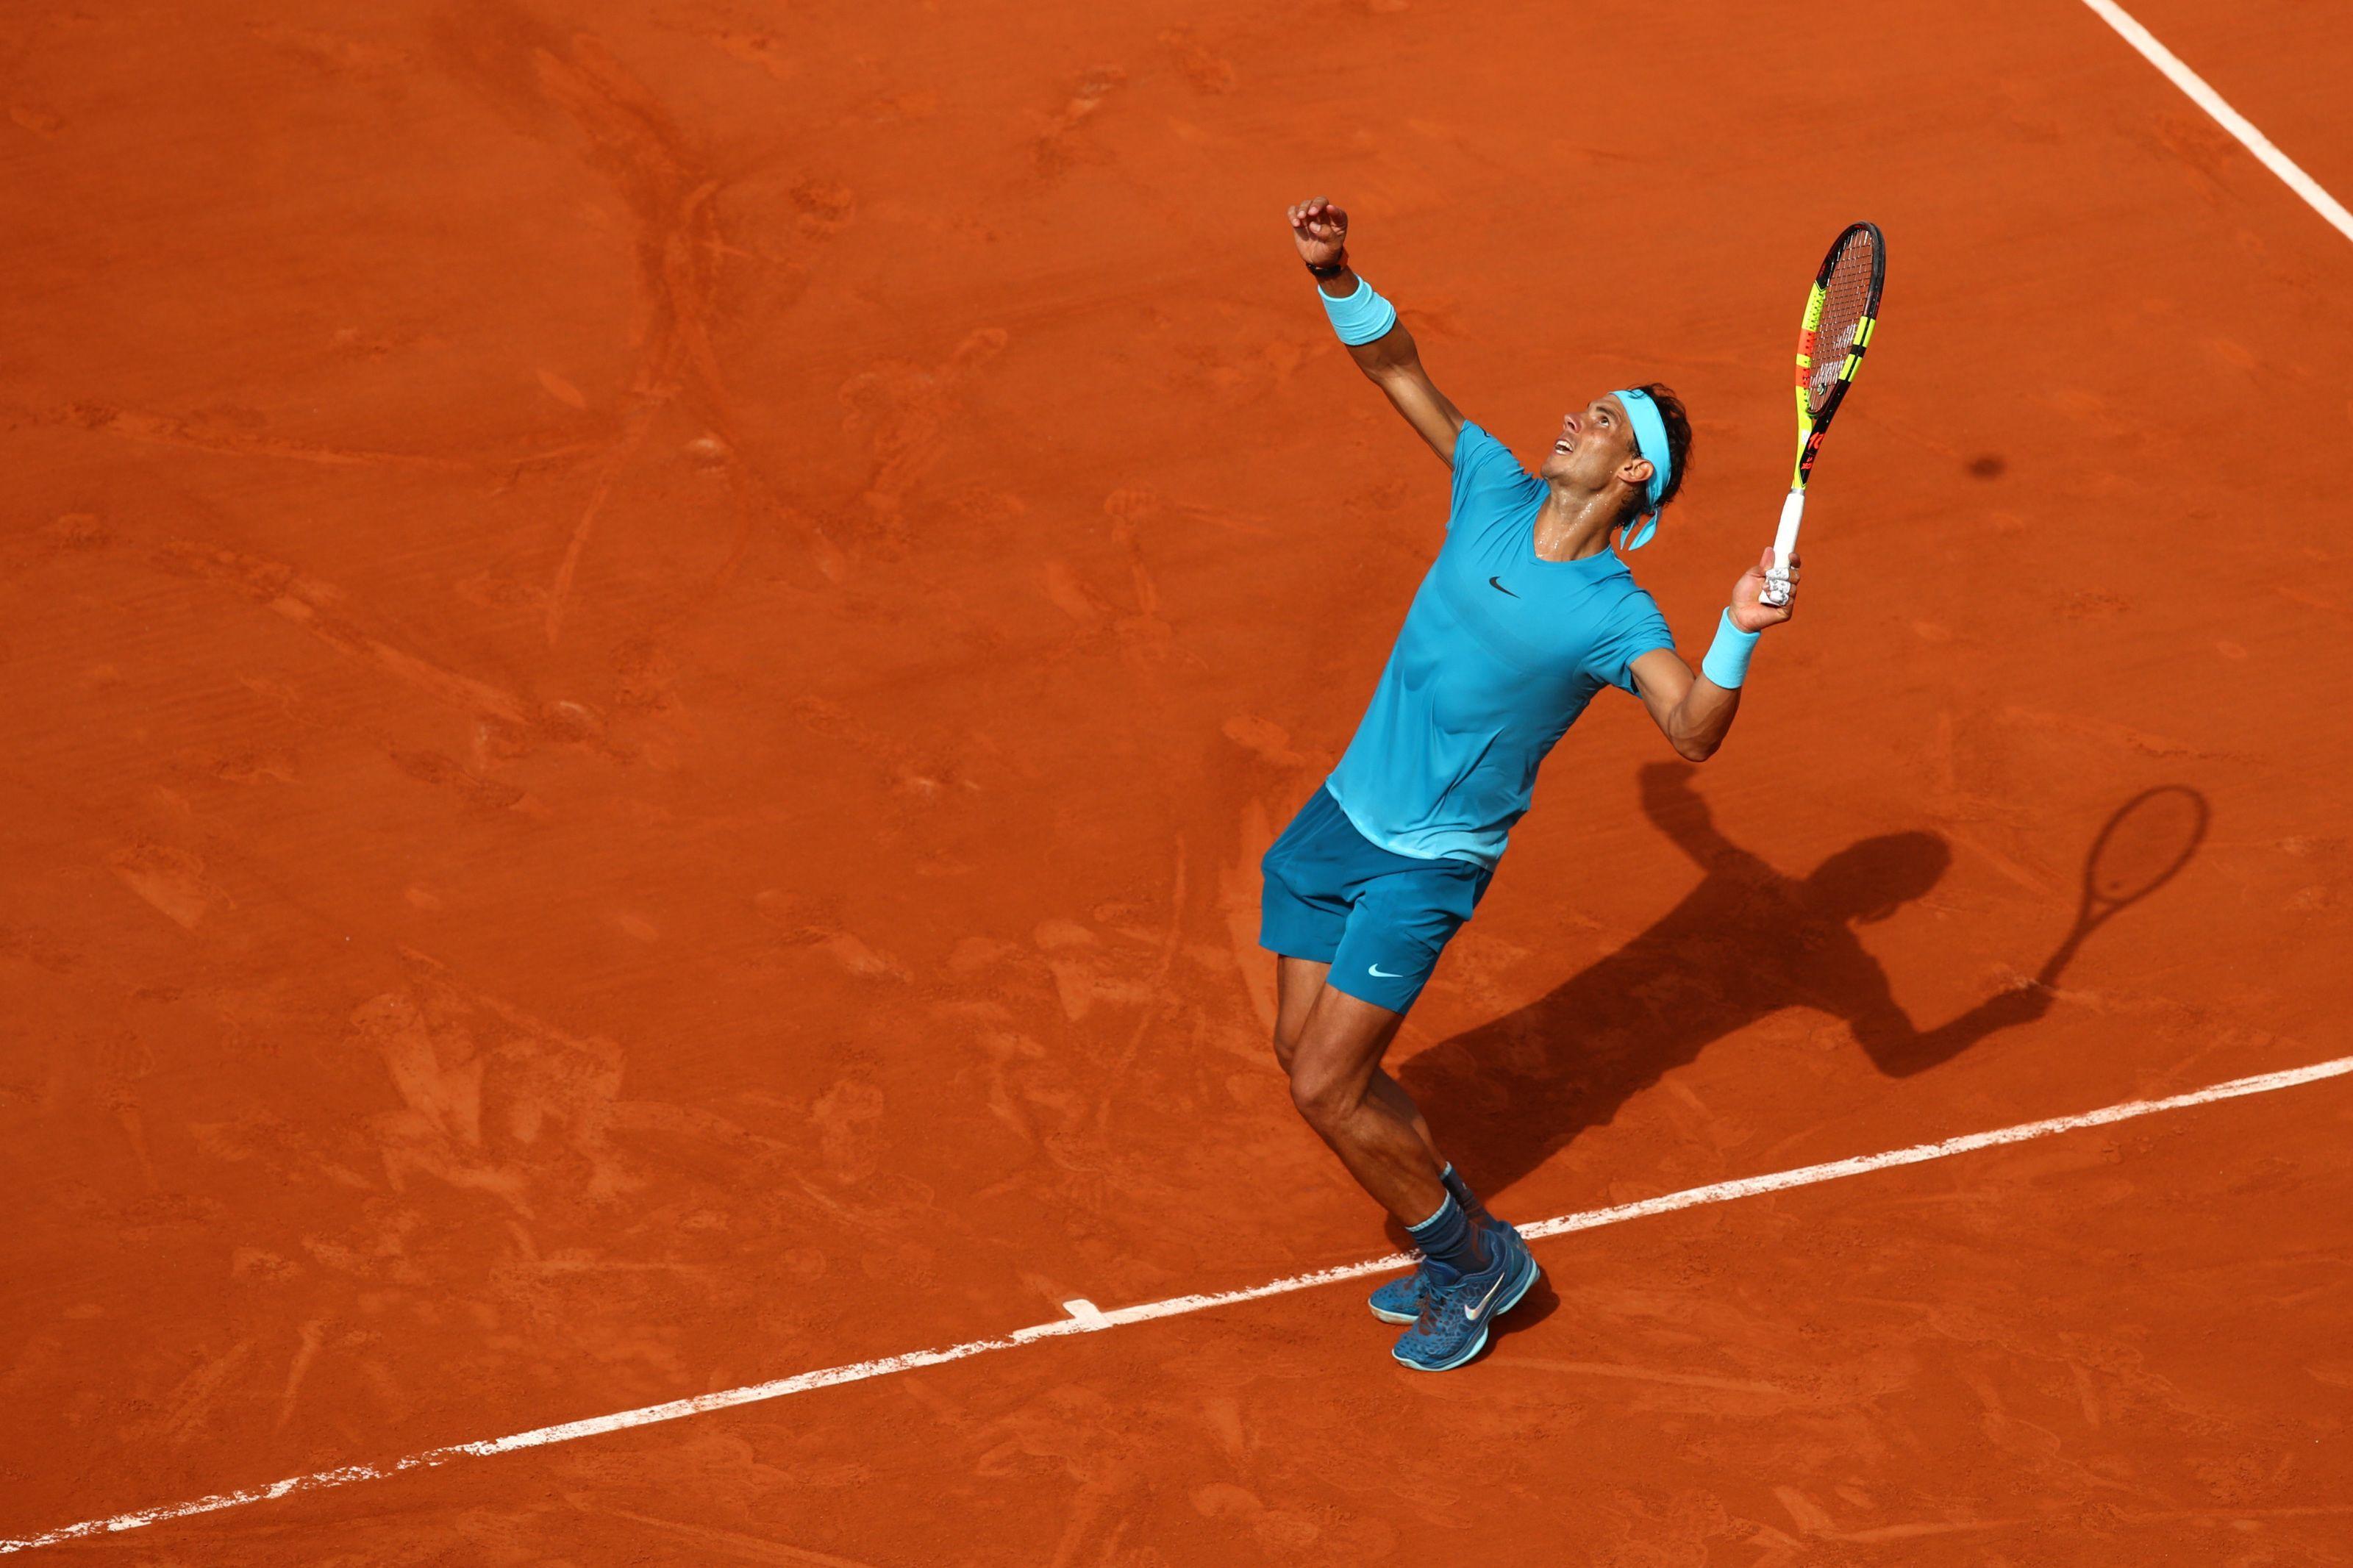 Pin By Velvetmoonbrigitte On ラファ French Open Rafael Nadal French